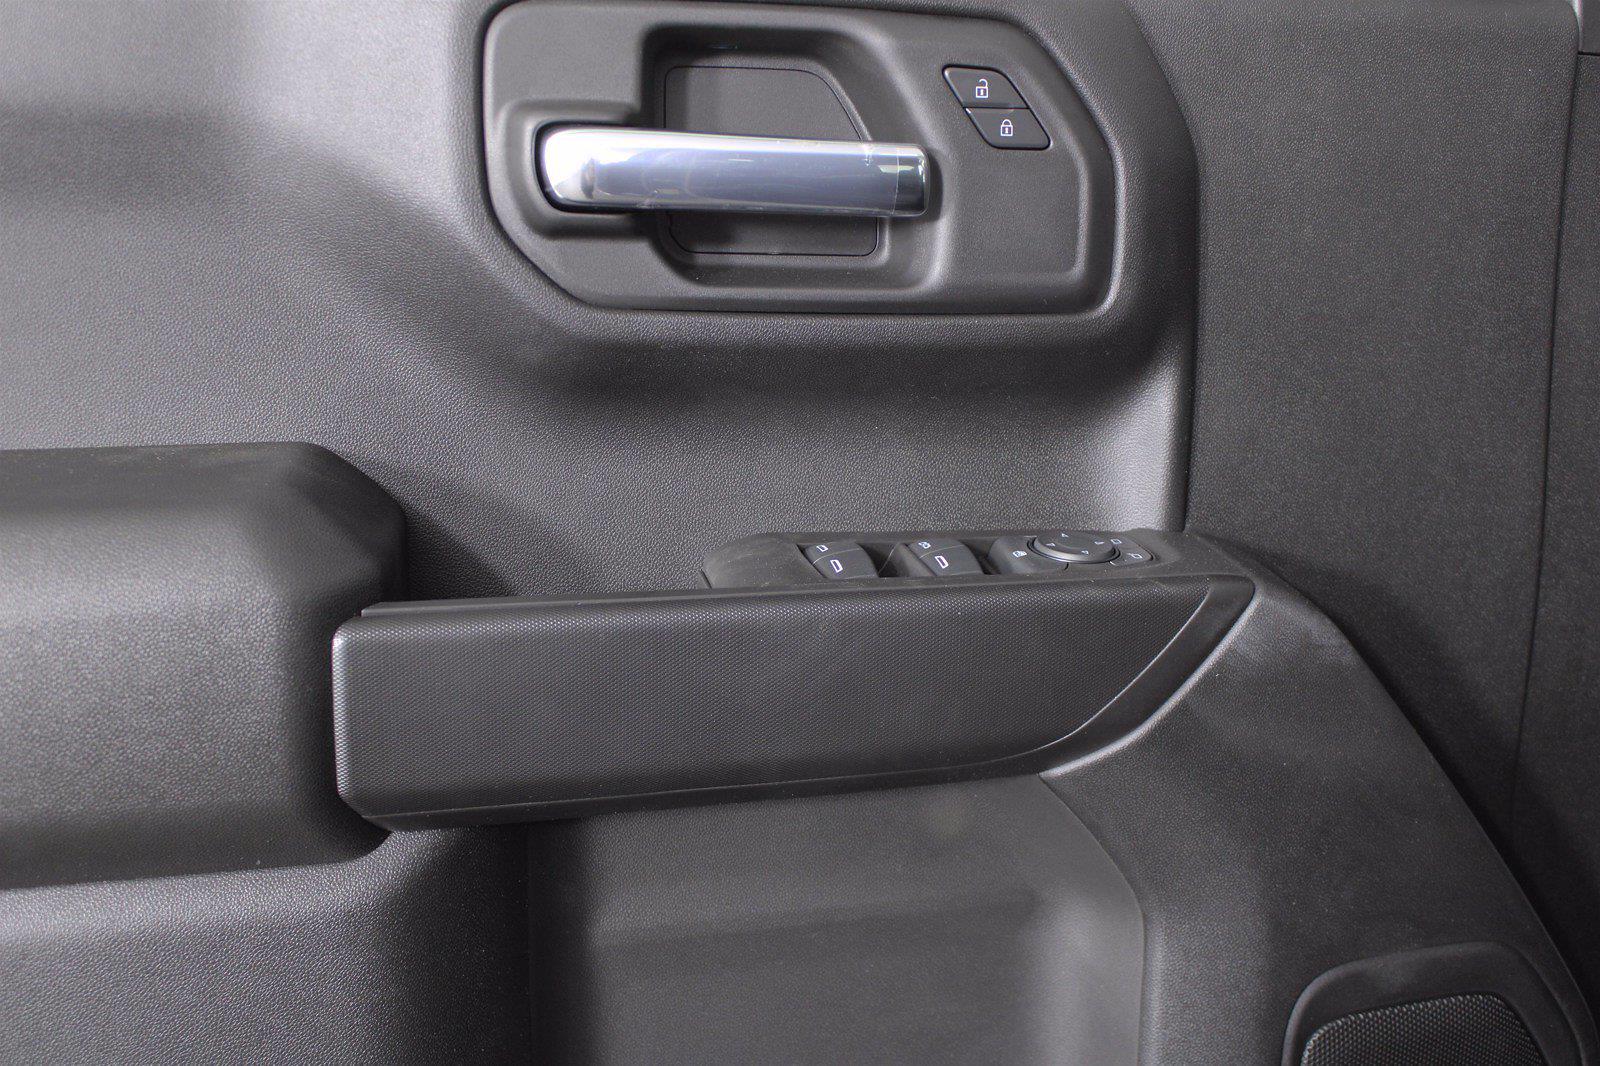 2021 Chevrolet Silverado 1500 Double Cab 4x4, Pickup #D111002 - photo 11